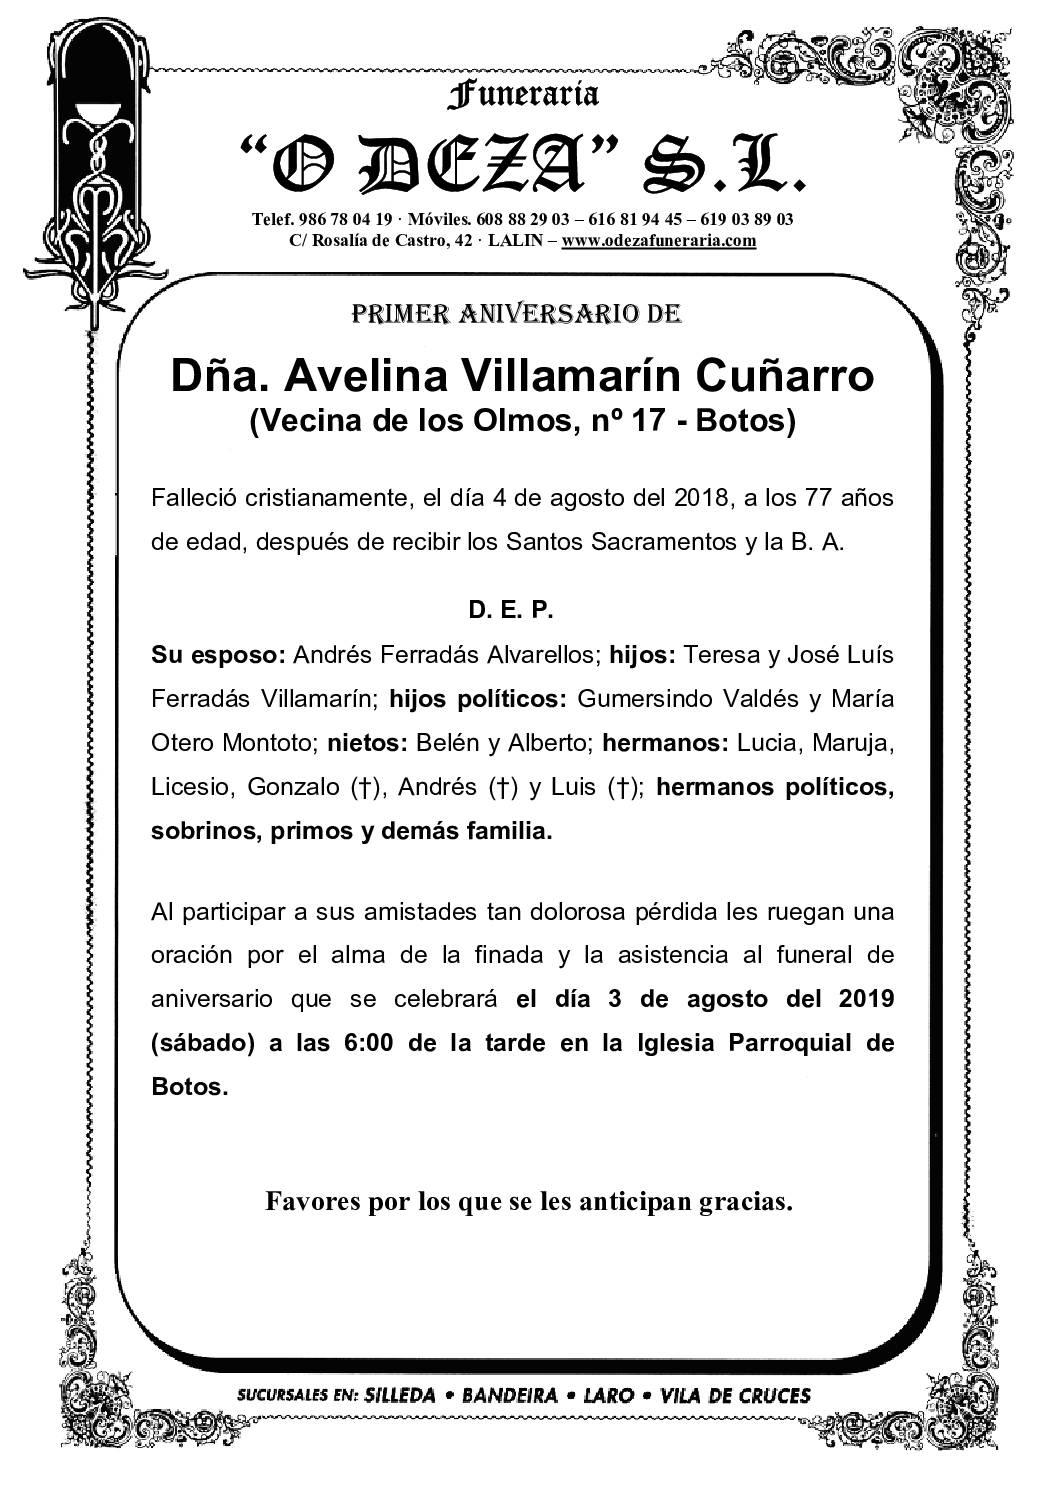 DÑA. AVELINA VILLAMARÍN CUÑARRO